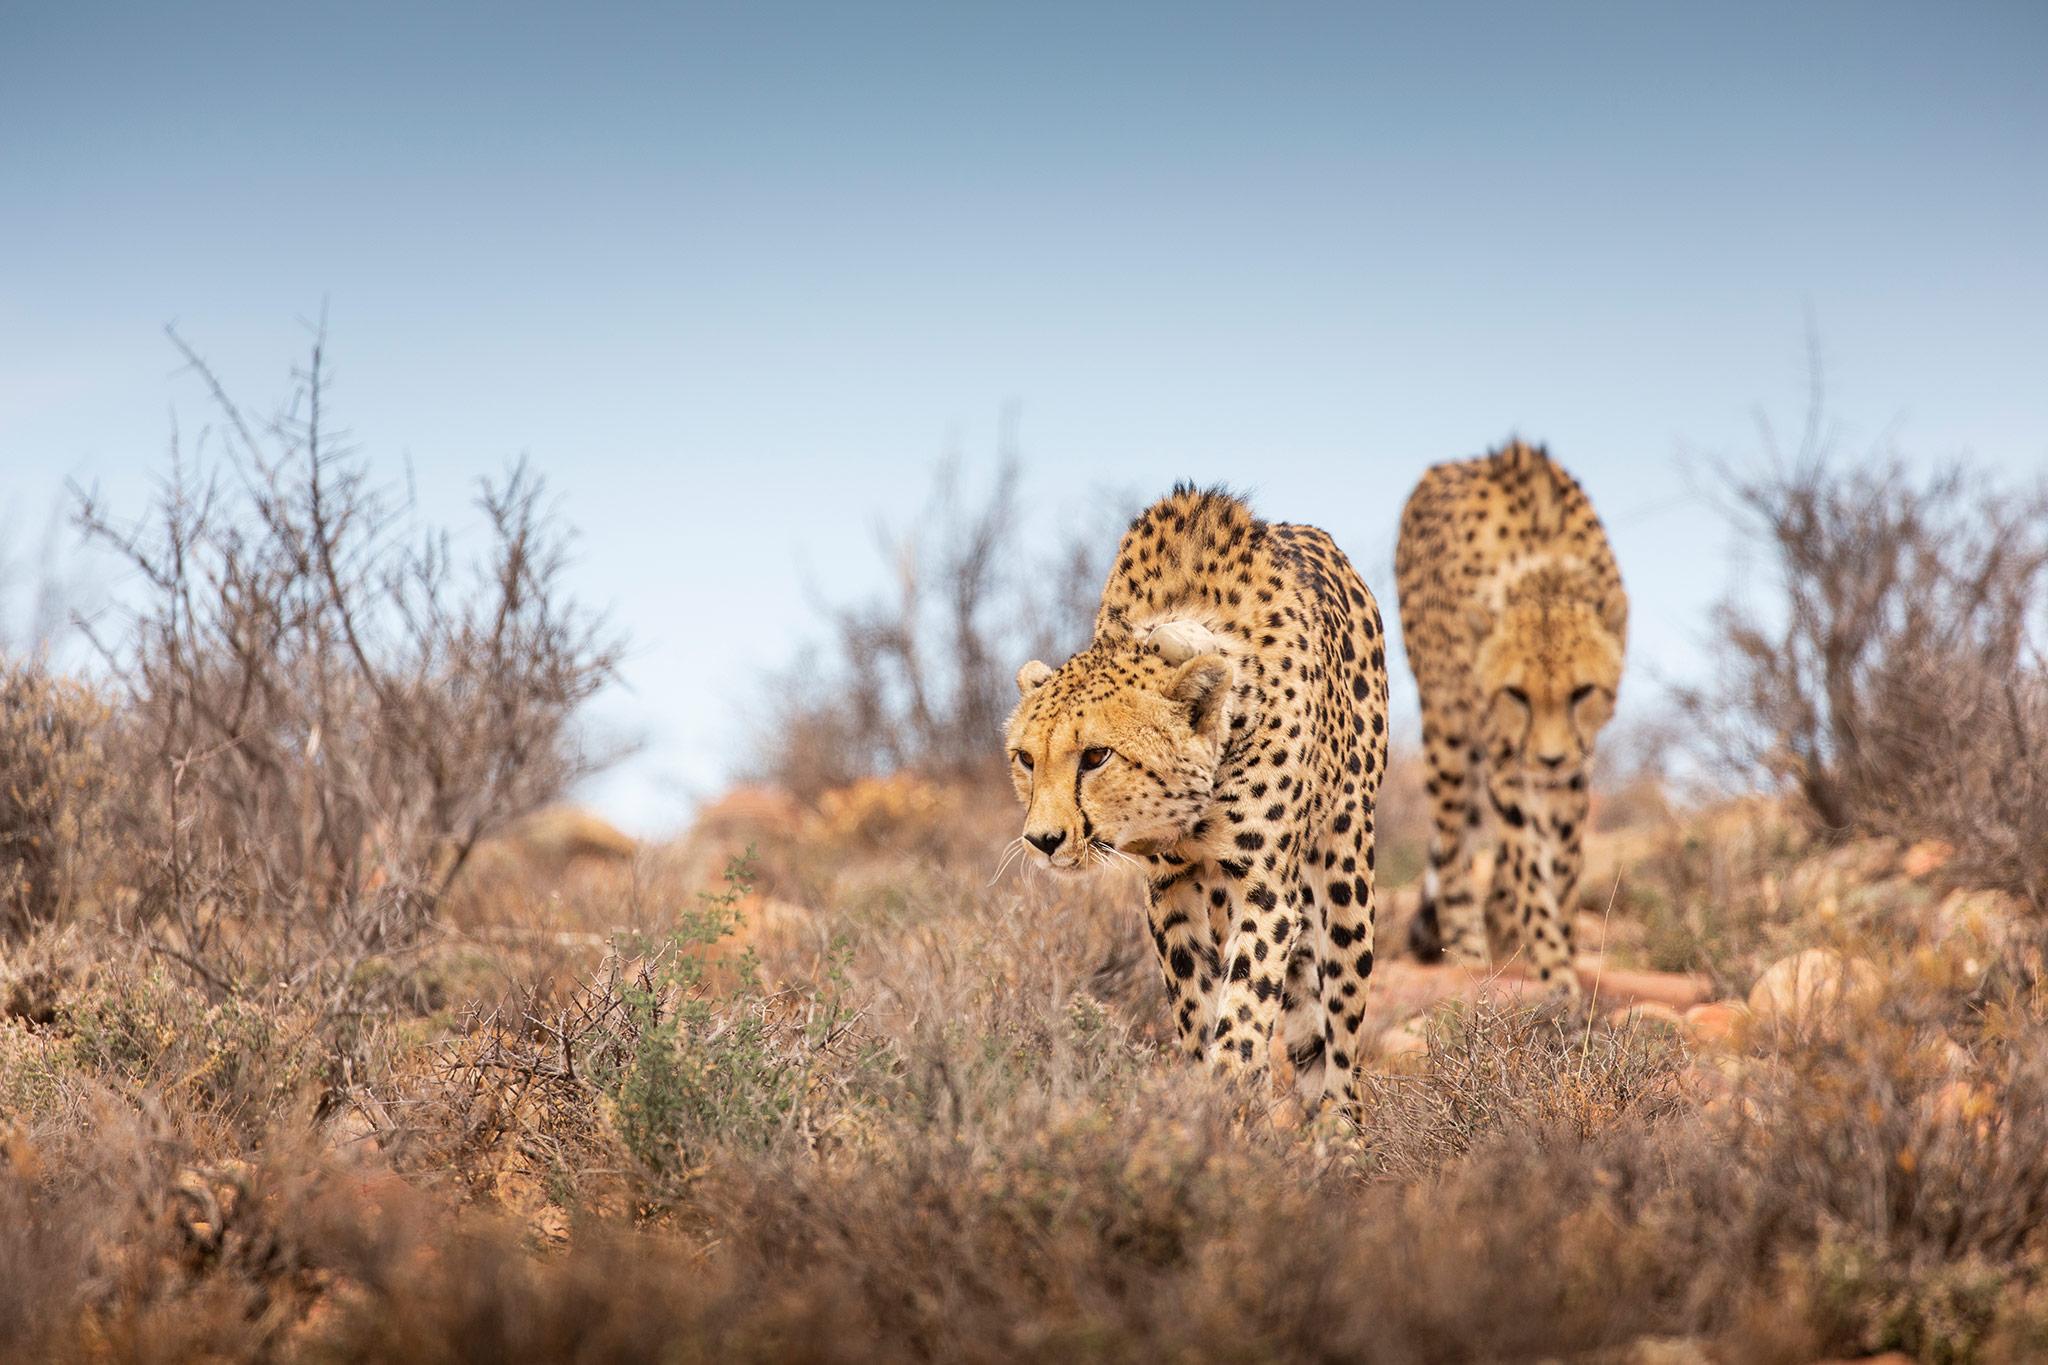 Cheetah_Roam_TCunniffe_073.jpg